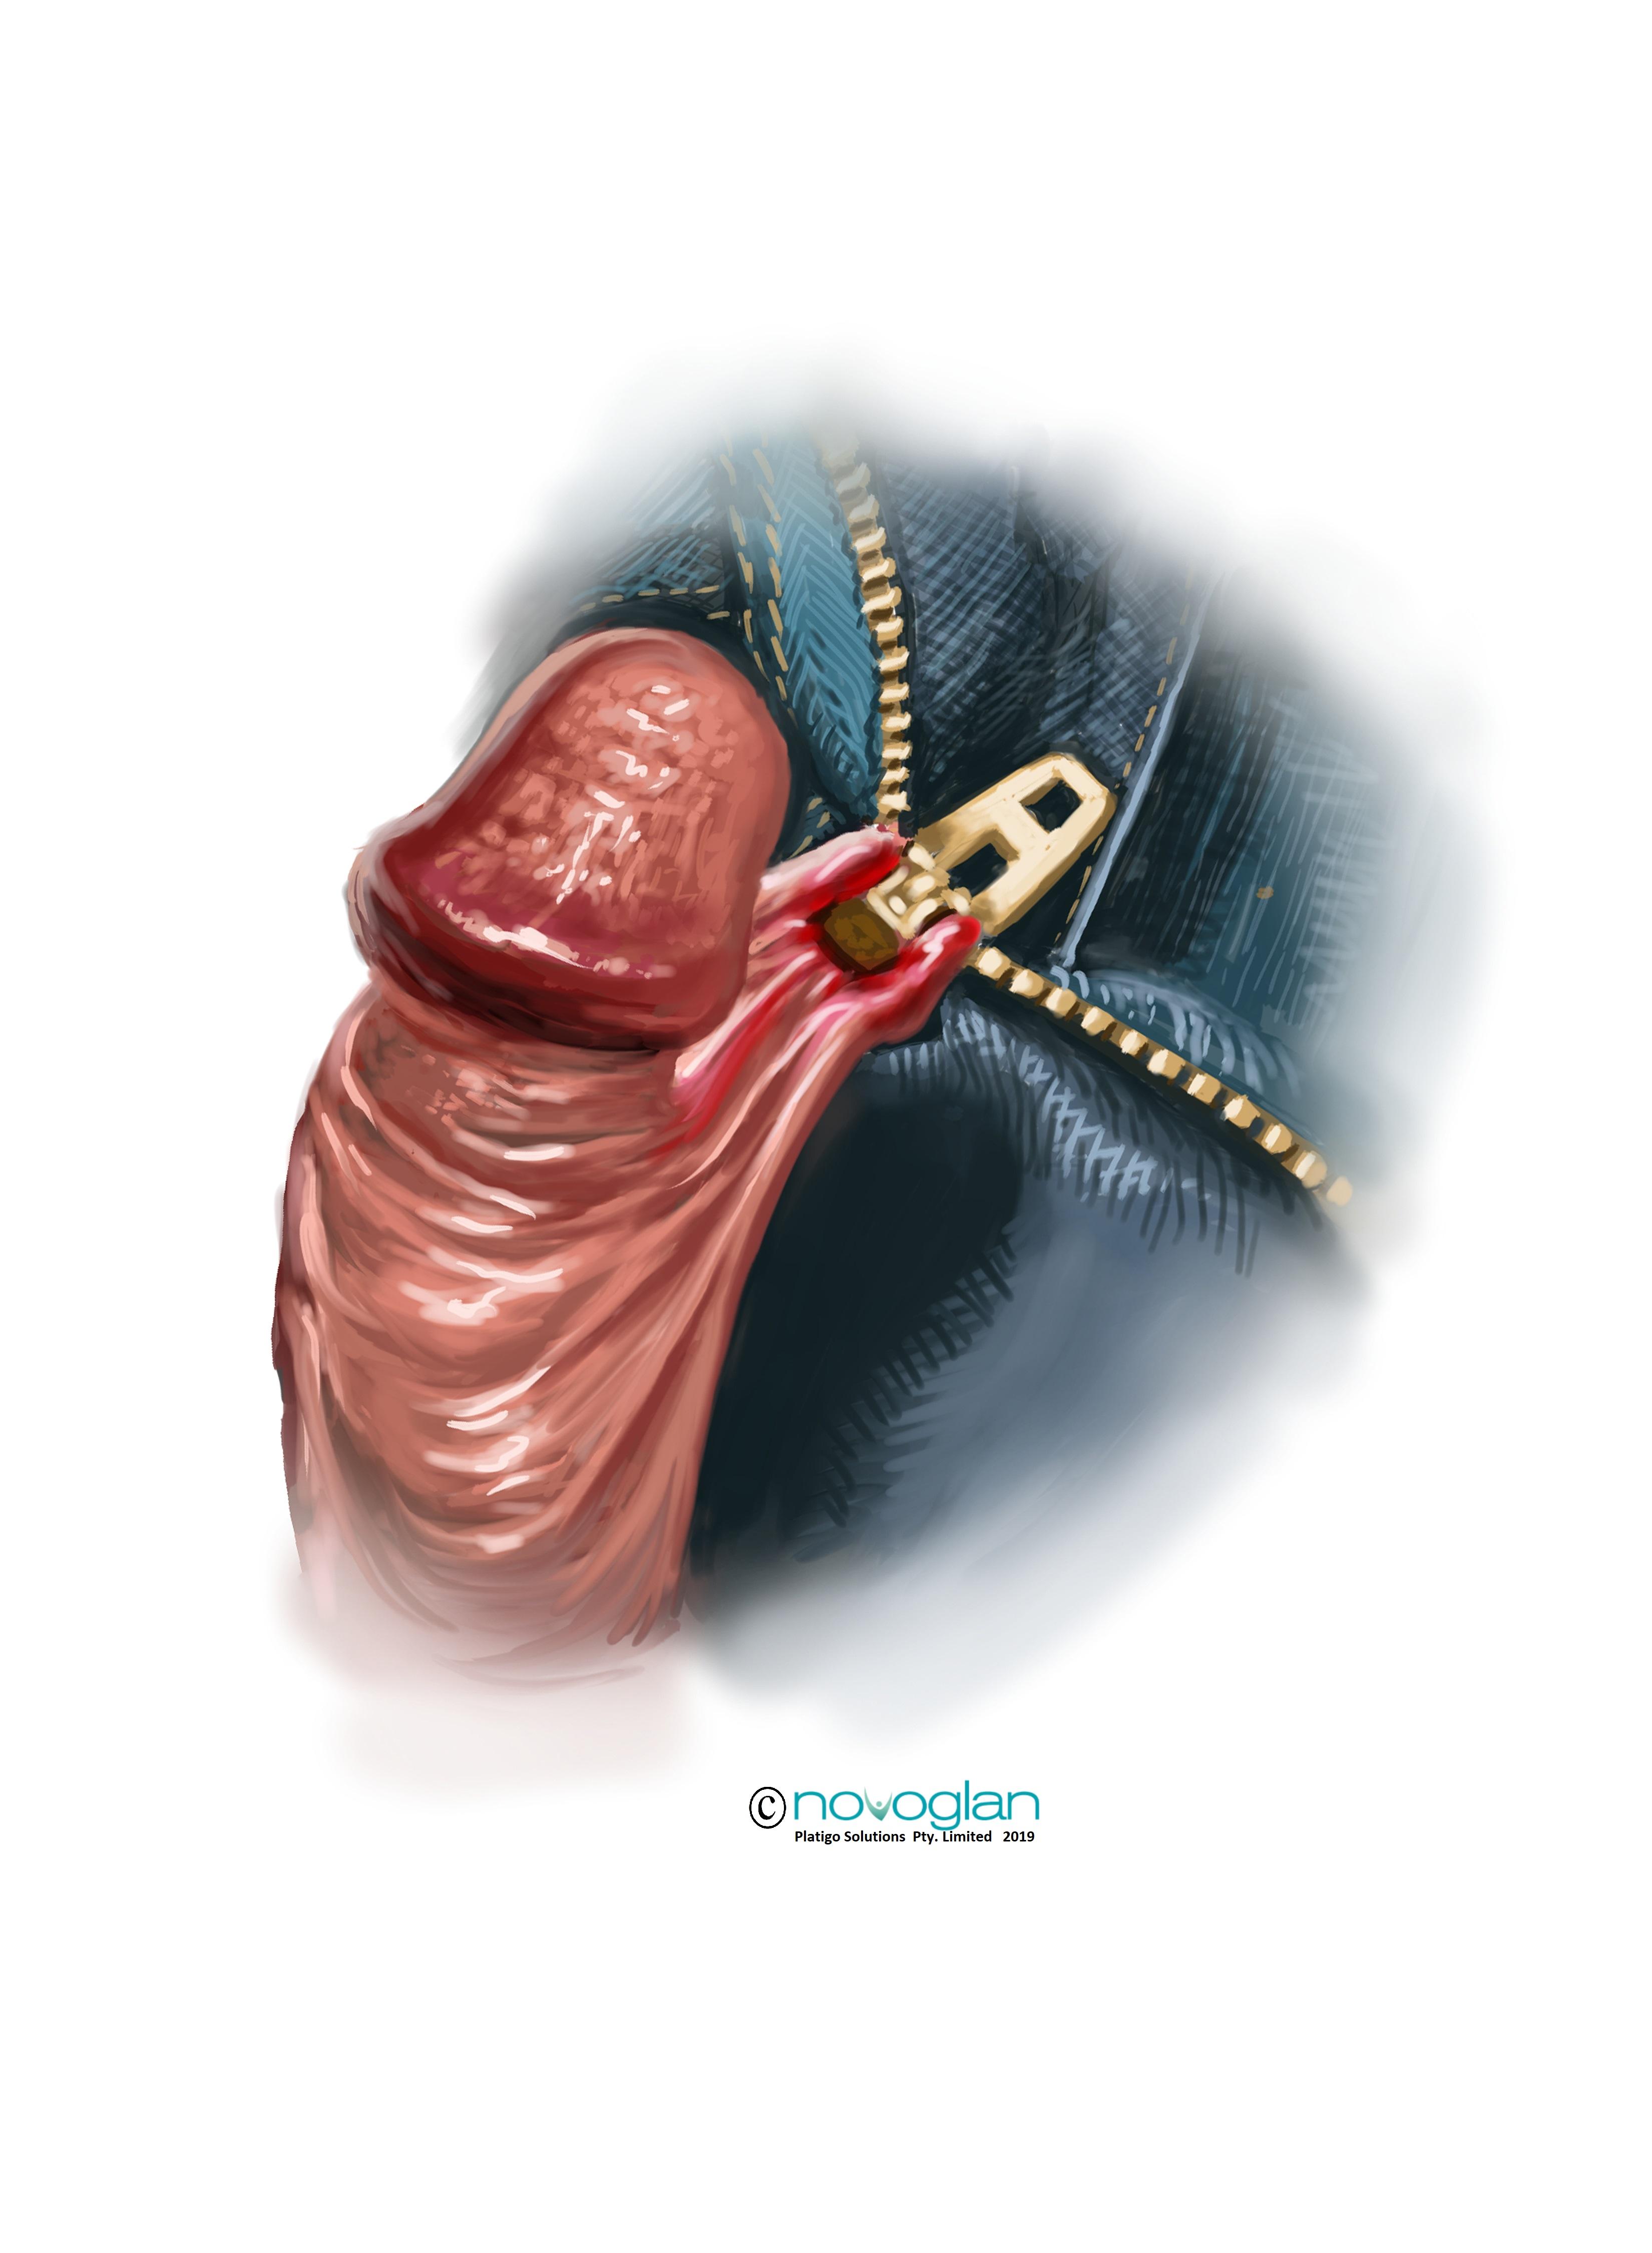 Foreskin-Zipper-Trauma-Treatment-with-novoglan